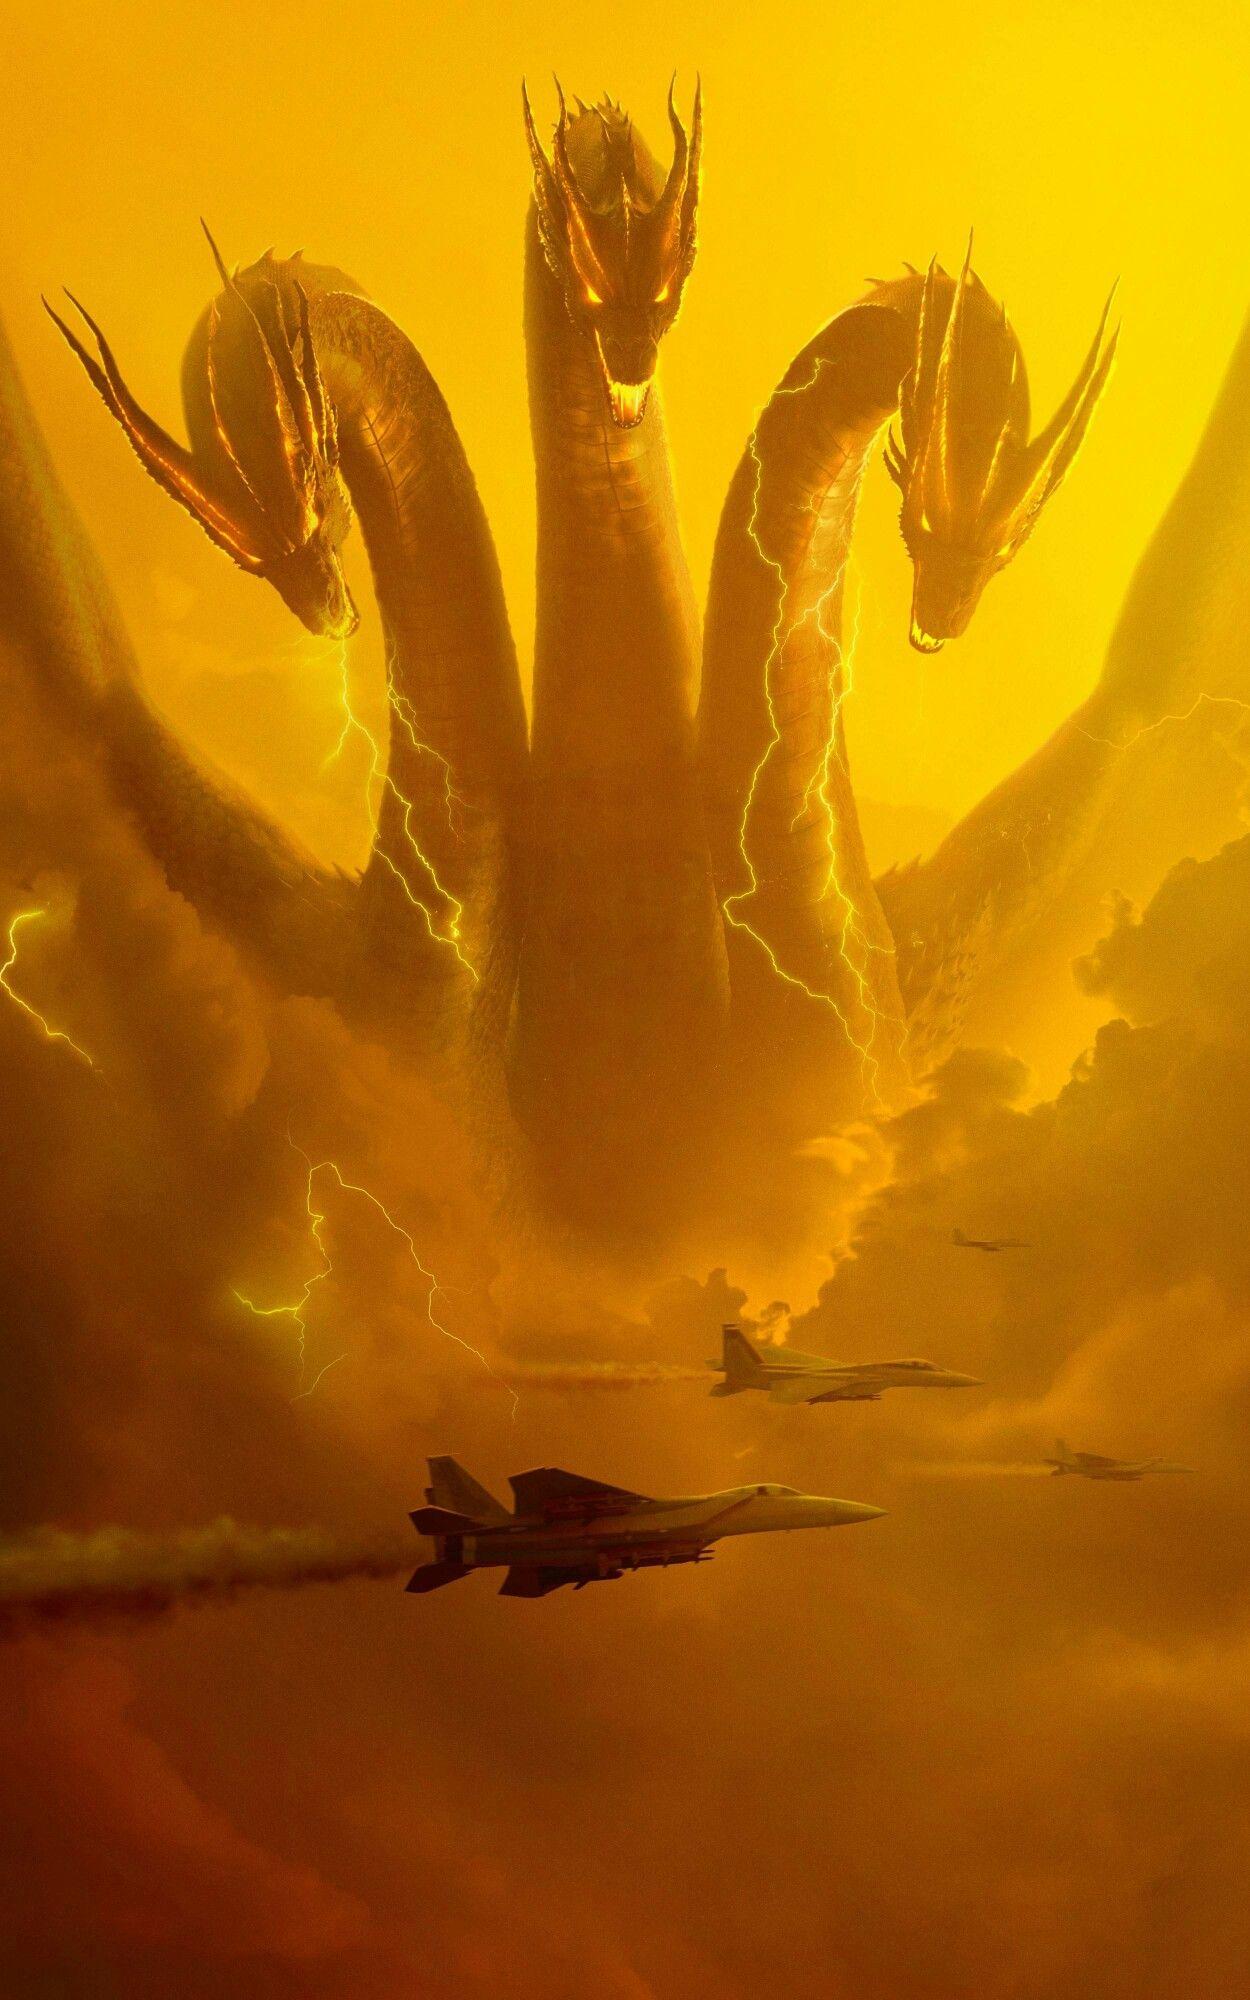 Pin by Kayla Melville on Mythical Animals Godzilla